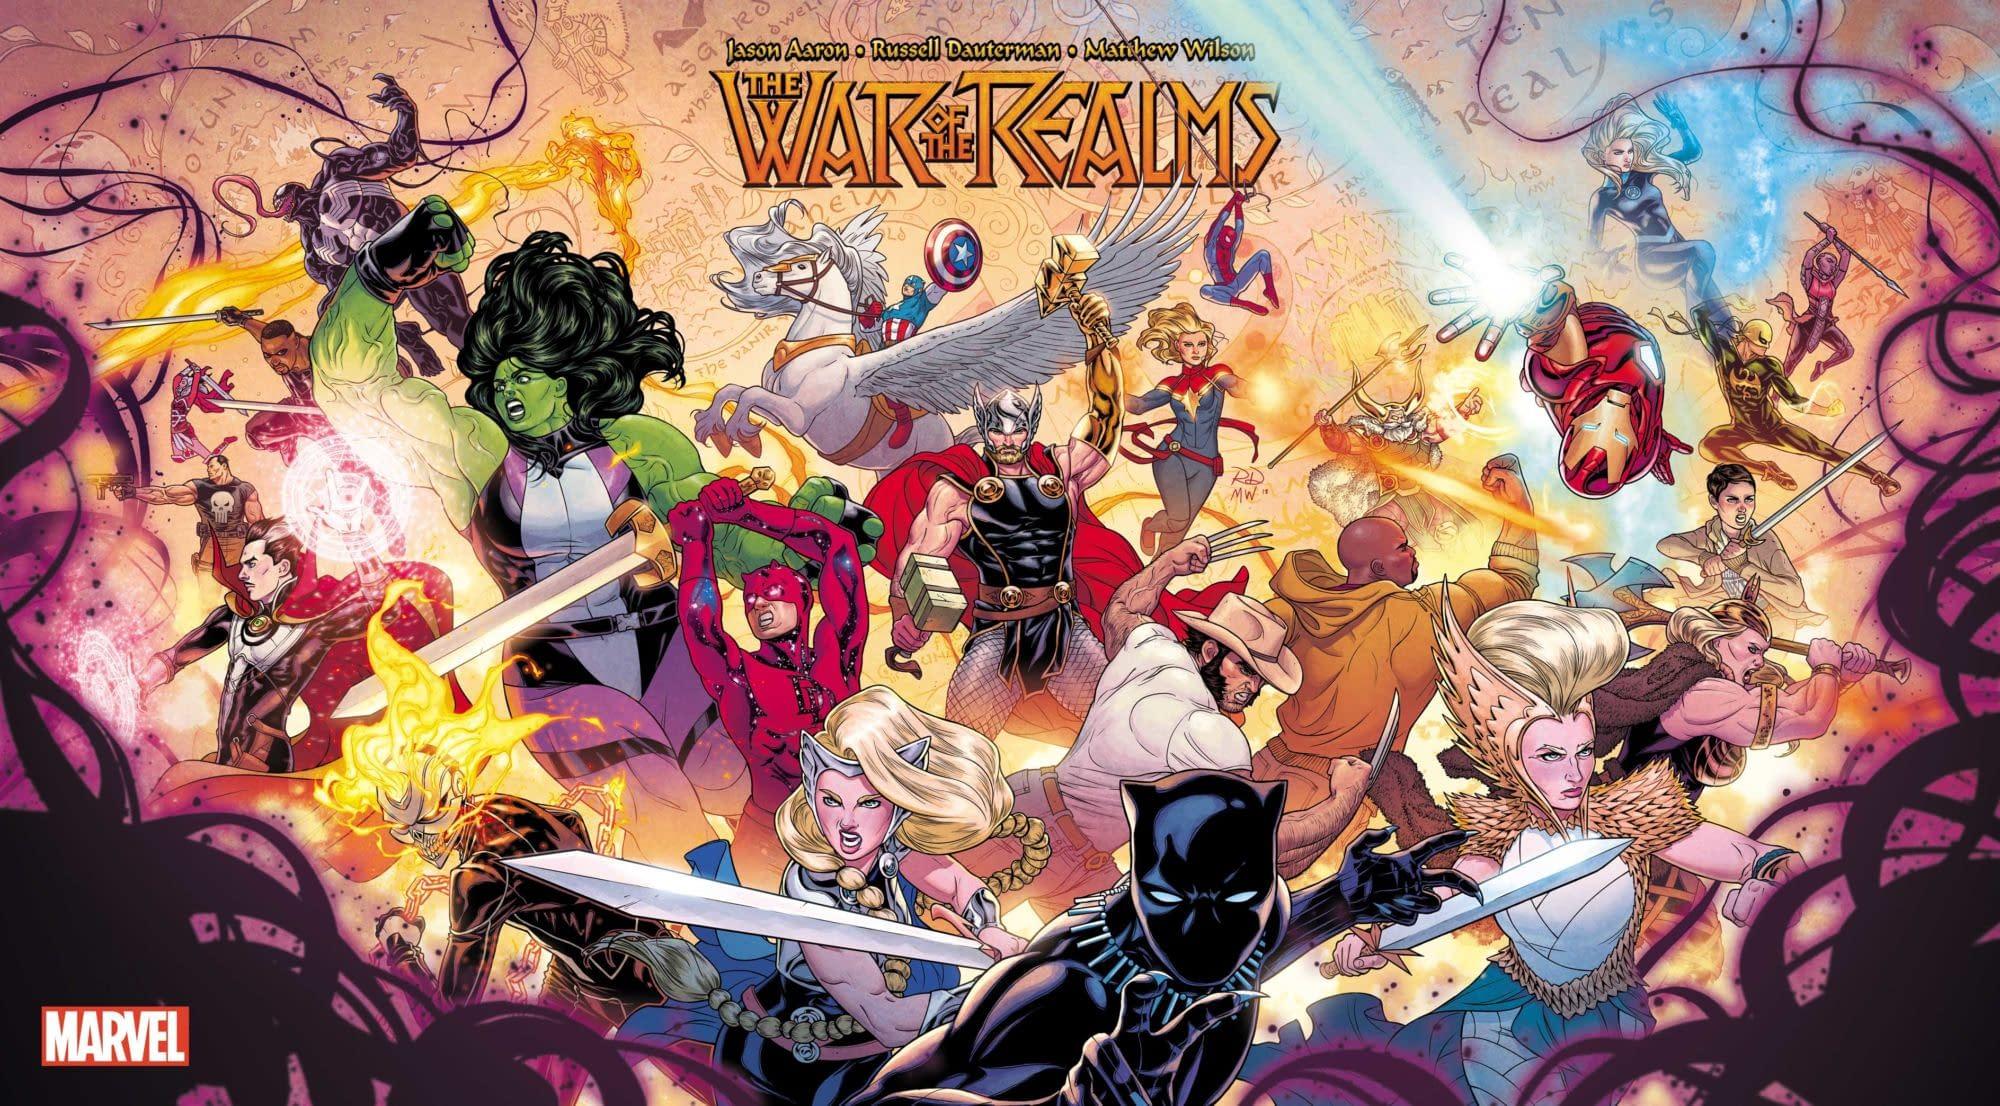 War of the Realms, Bigger Than Secret Wars, Rocks the Marvel Universe in April